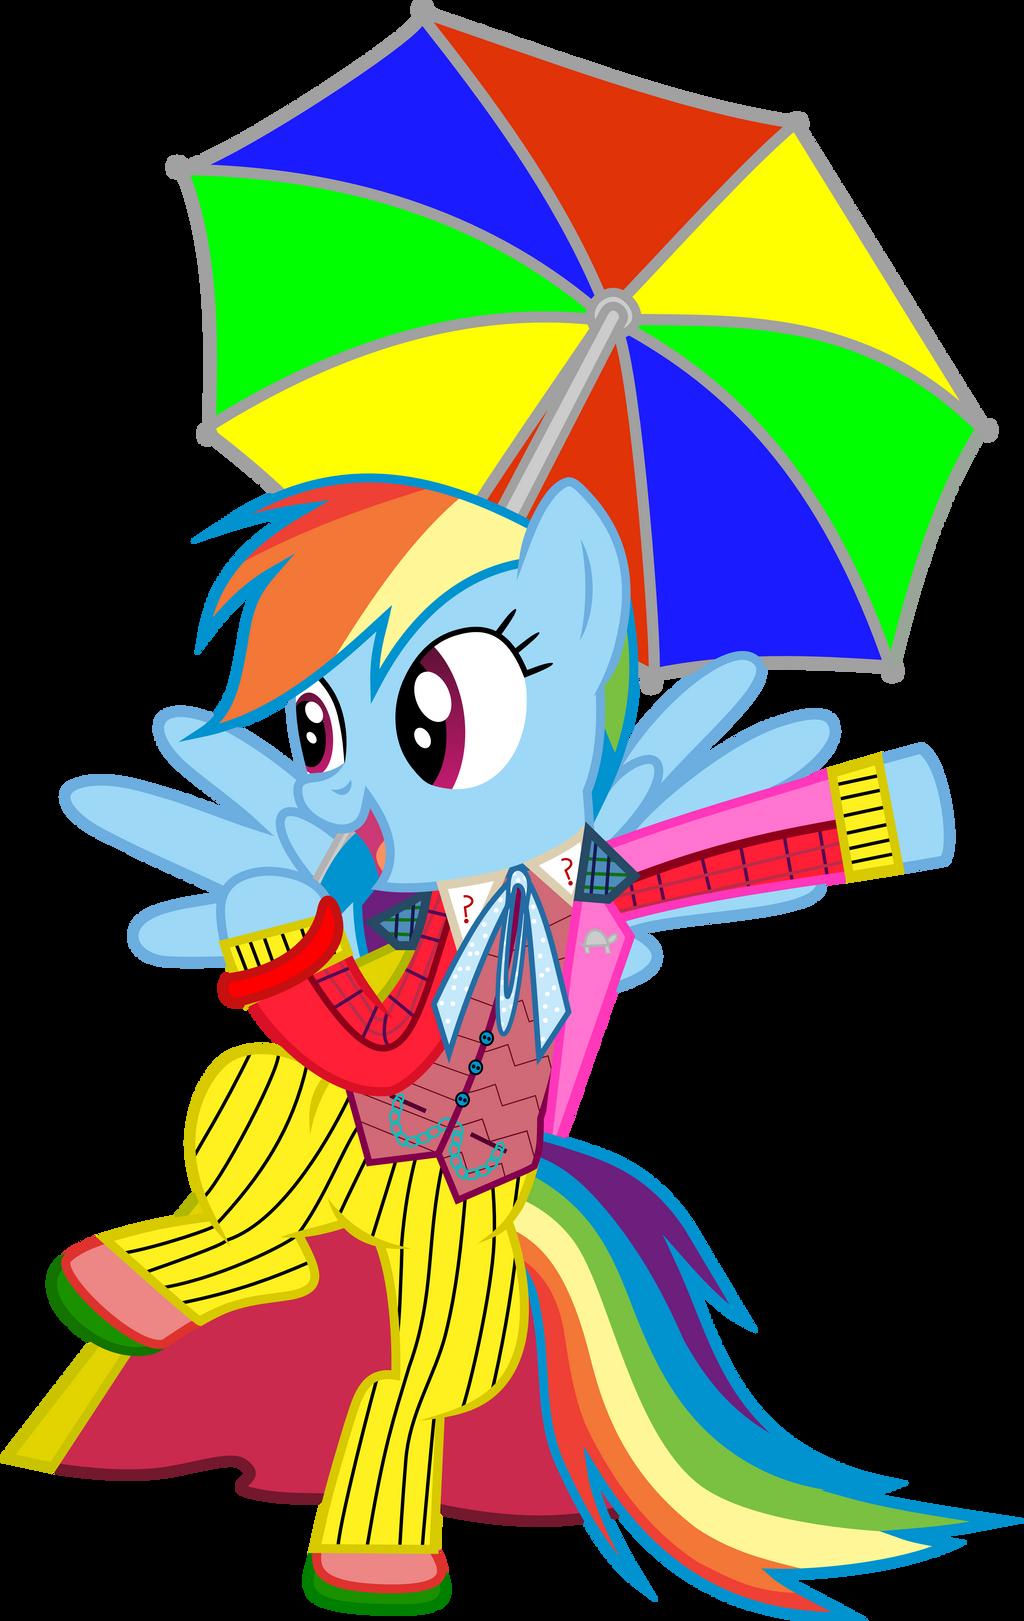 Rainbow Dash Always Dresses In Style By Jaybugjimmies On Deviantart